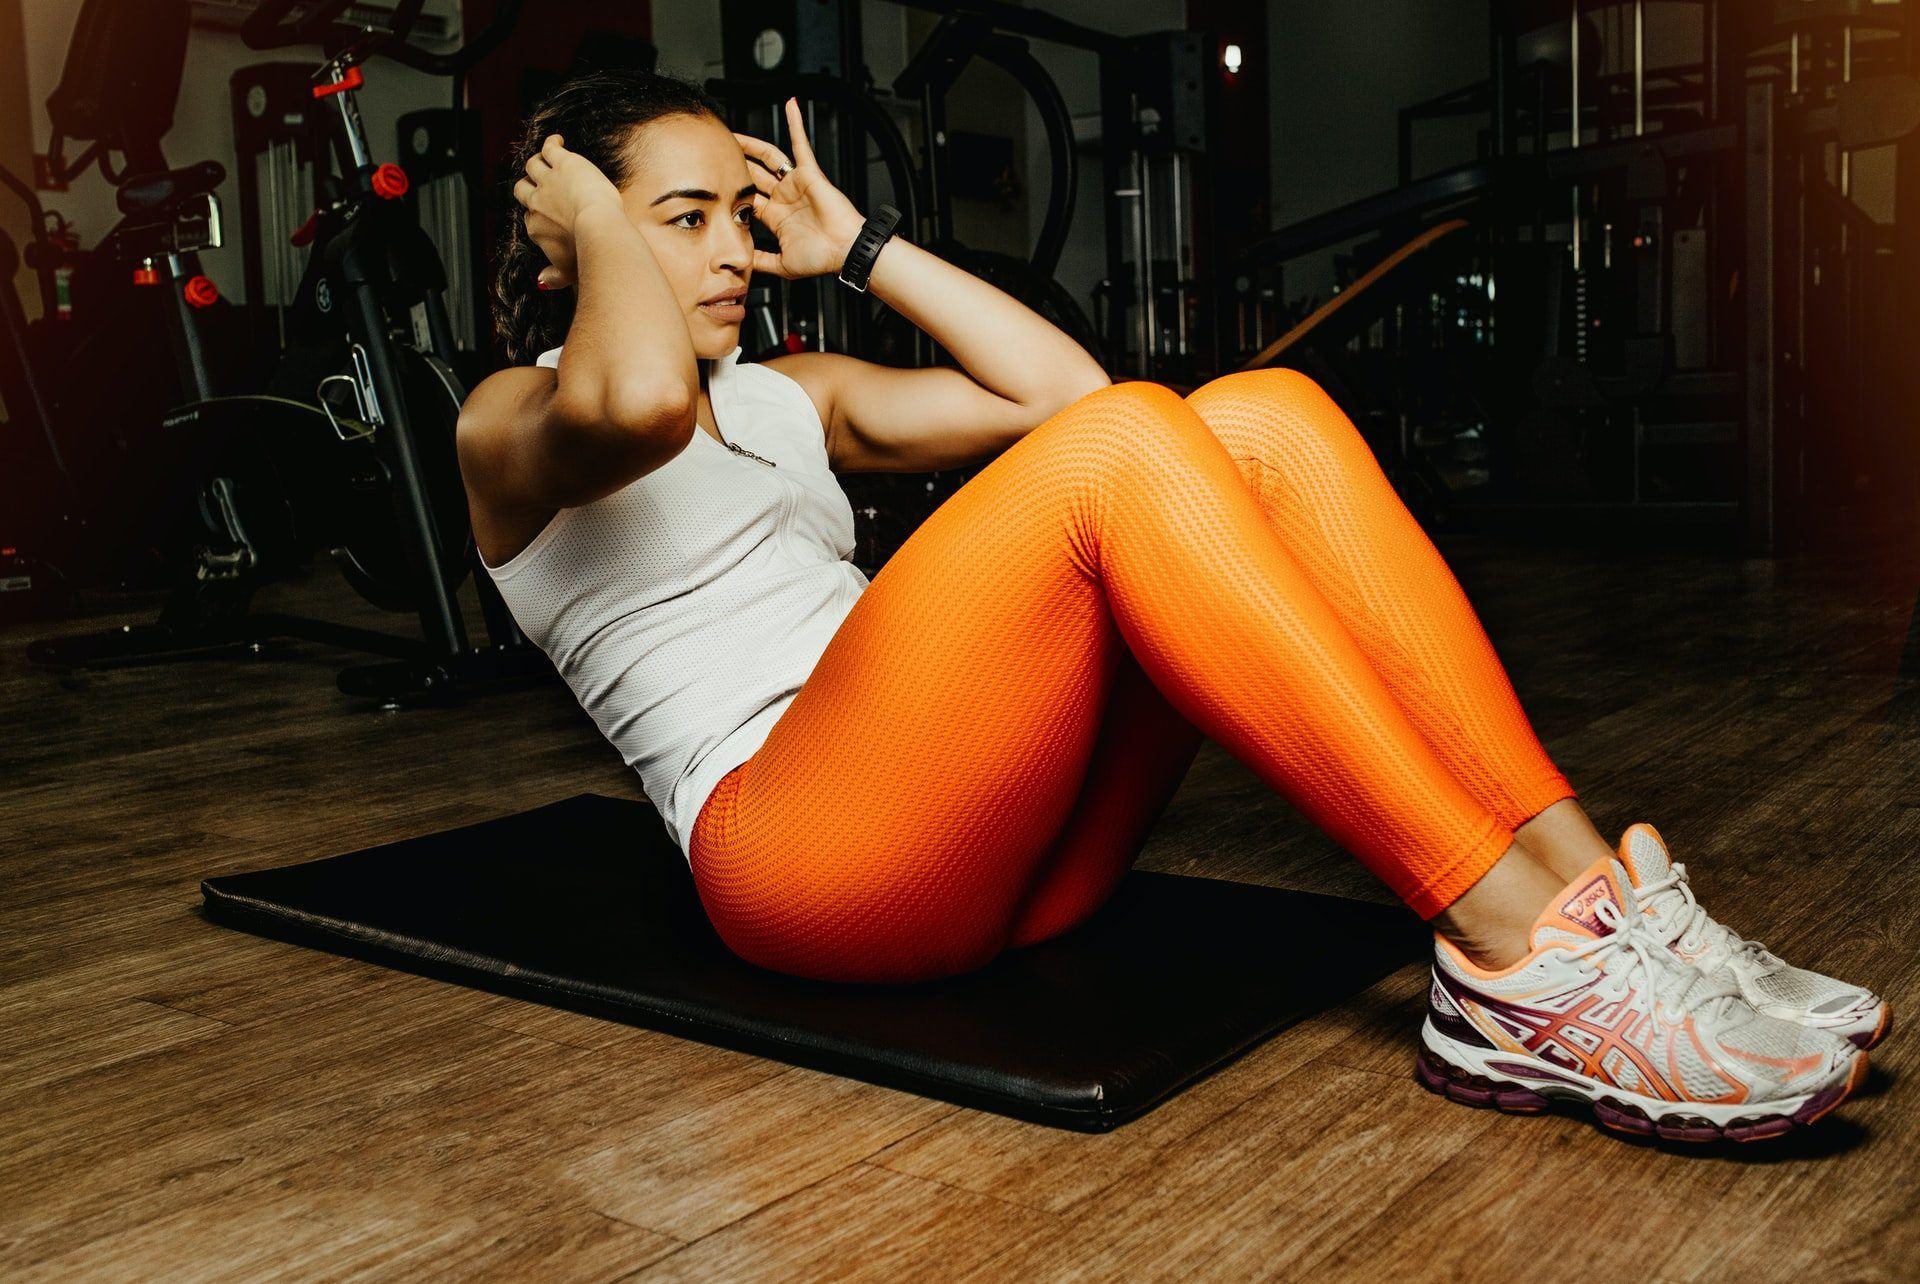 exercise regulary